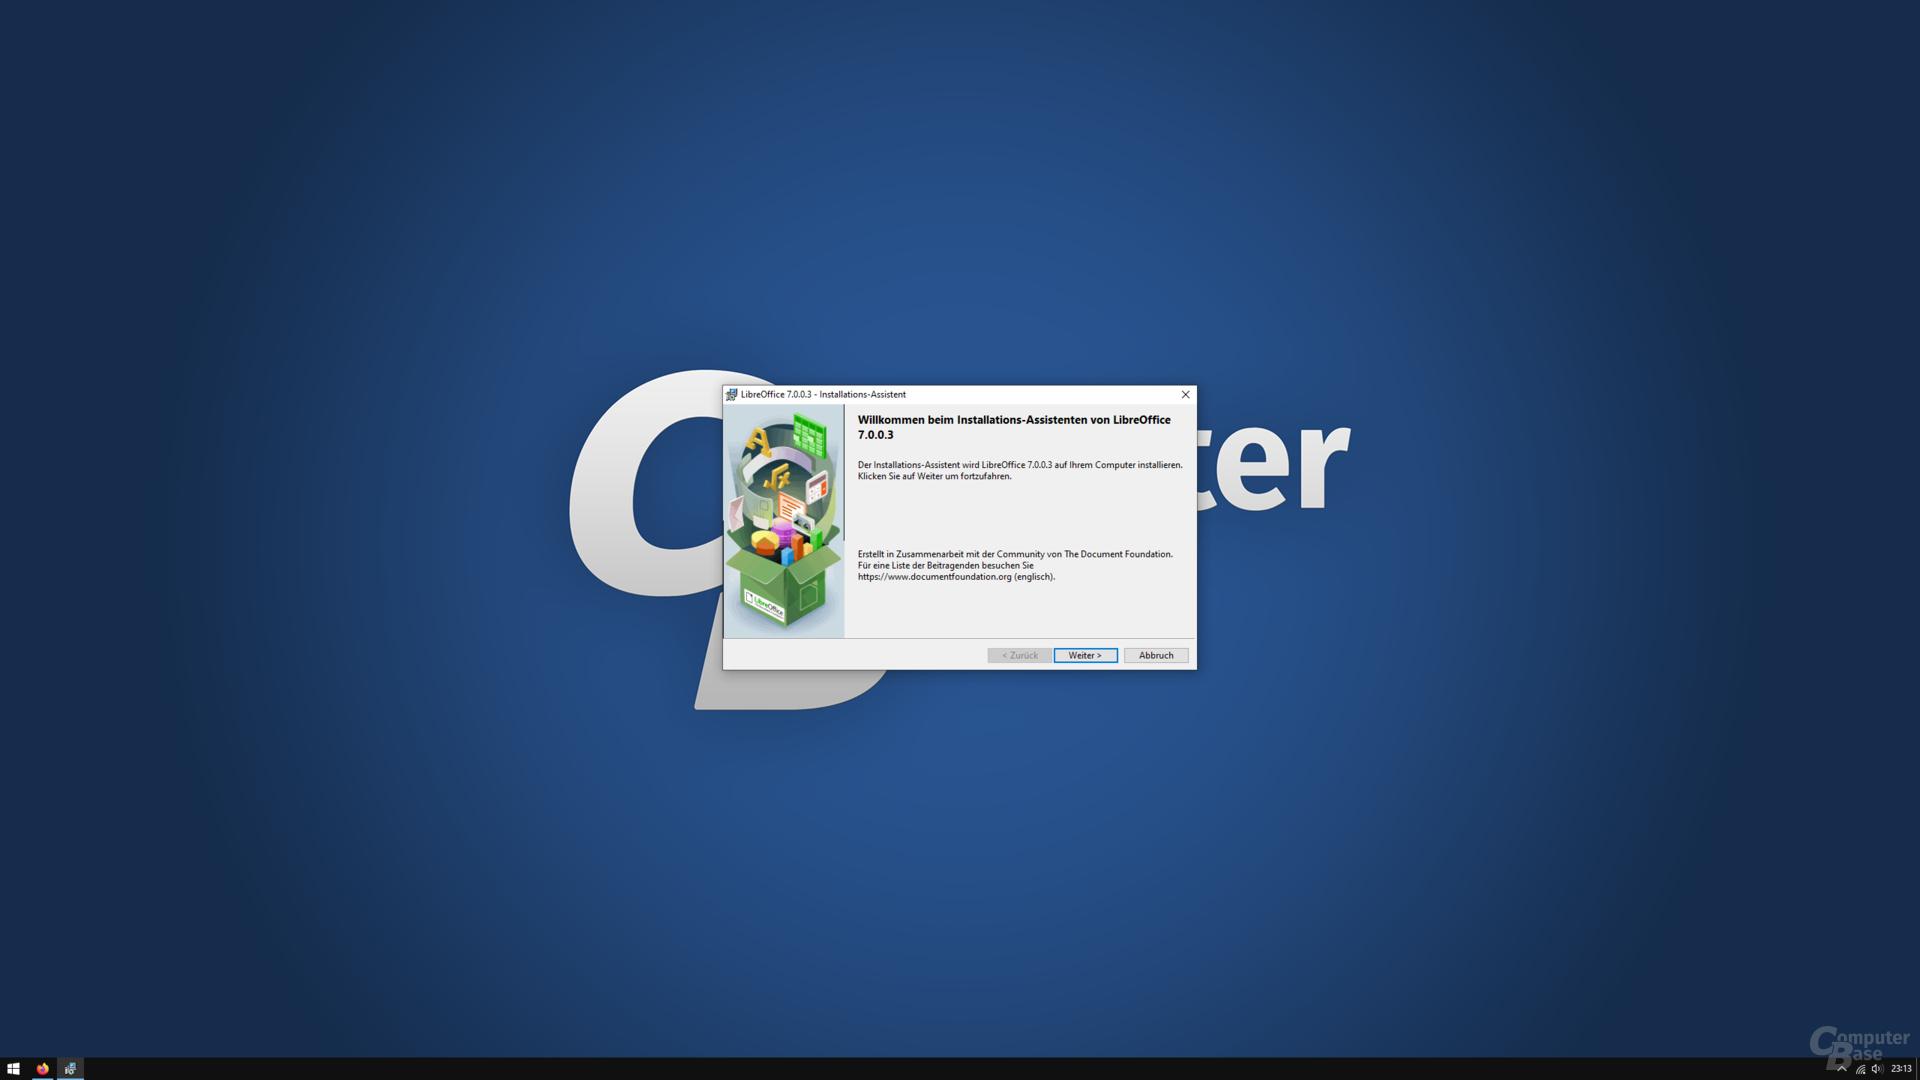 LibreOffice 7.0.0.3 – Installationsprozess